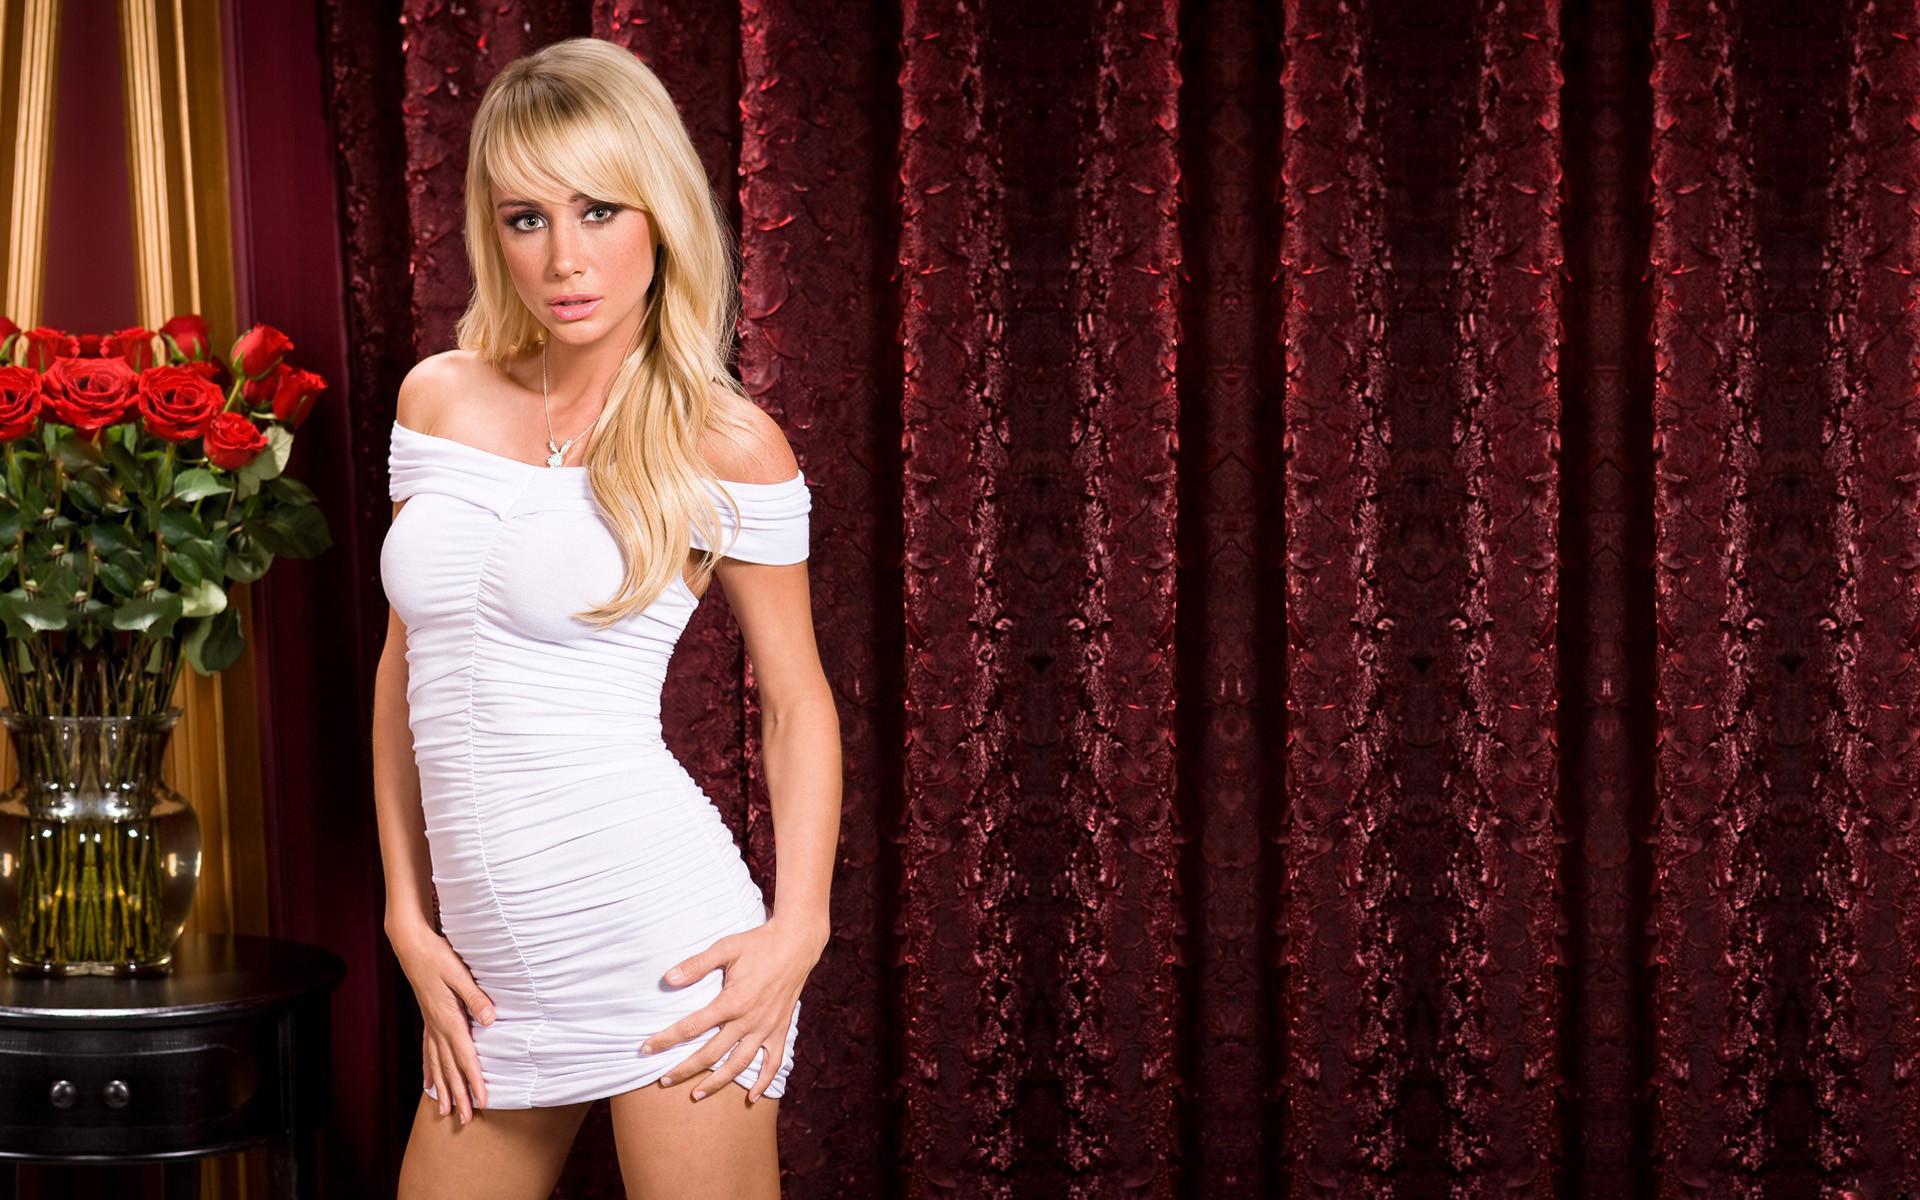 Sara Jean Underwood in a white dress